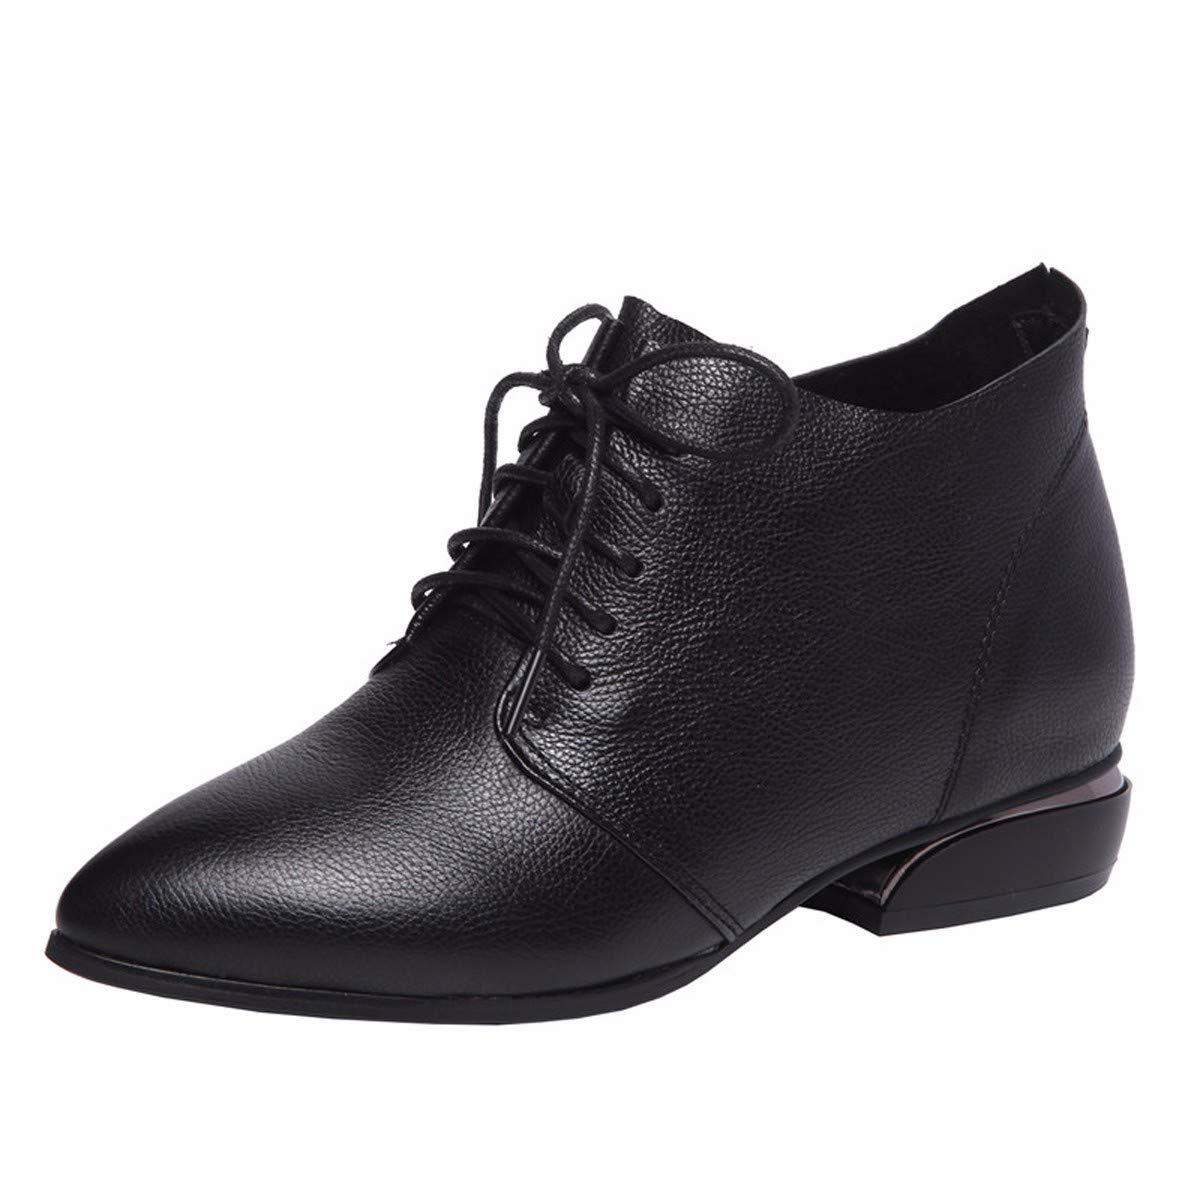 KOKQSX-Damen - Stiefel Leder innenhöhe Mode Kurze Stiefel ma dingxue